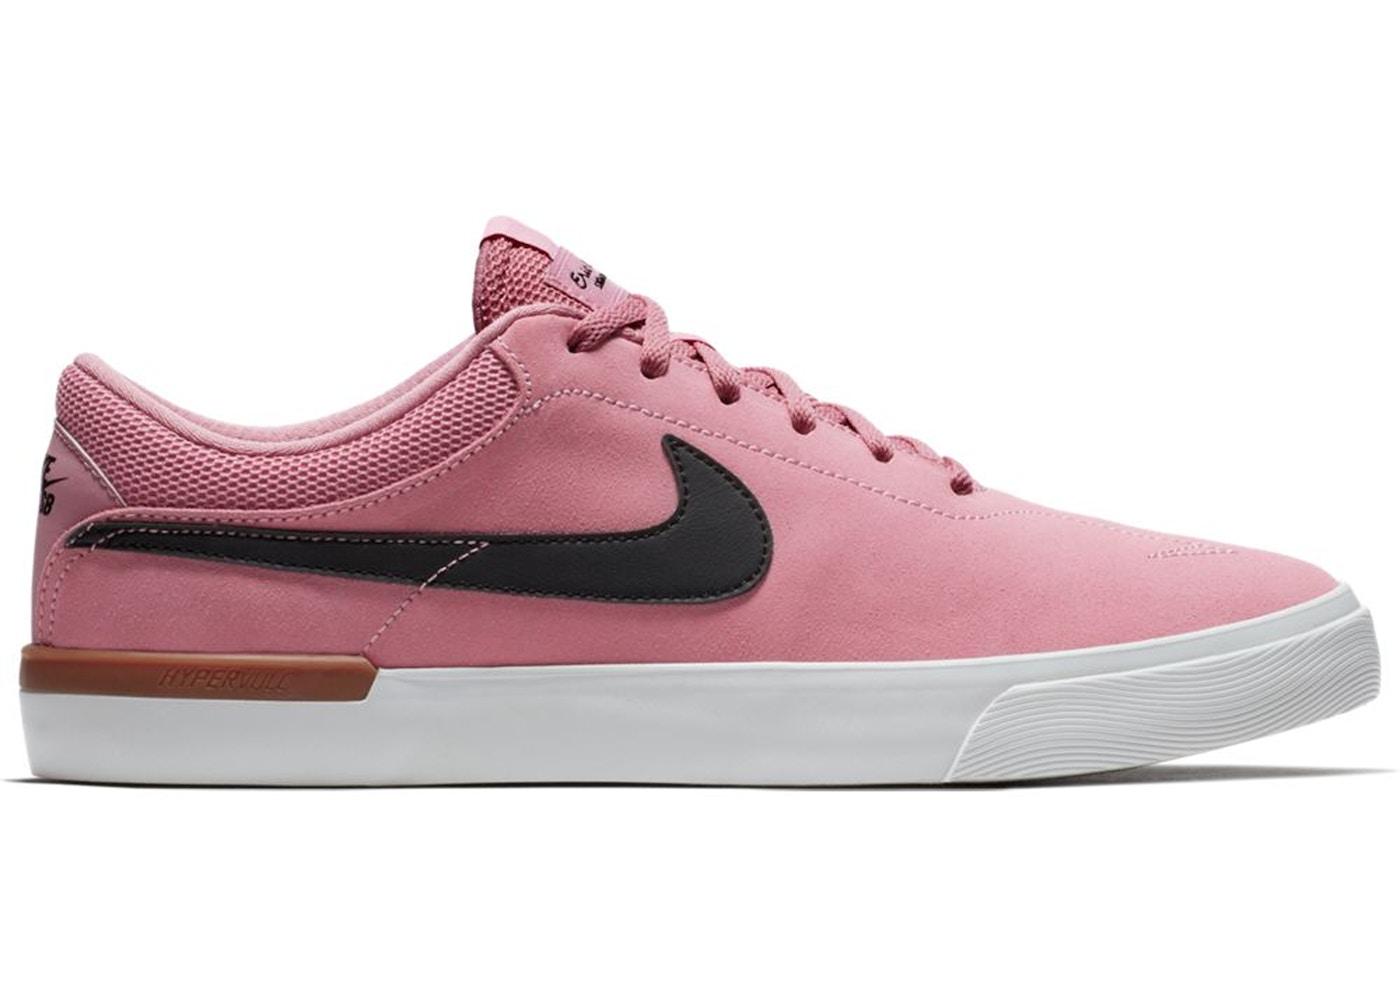 31f63b49ff11 Nike SB Koston Hypervulc Elemental Pink - 844447-600